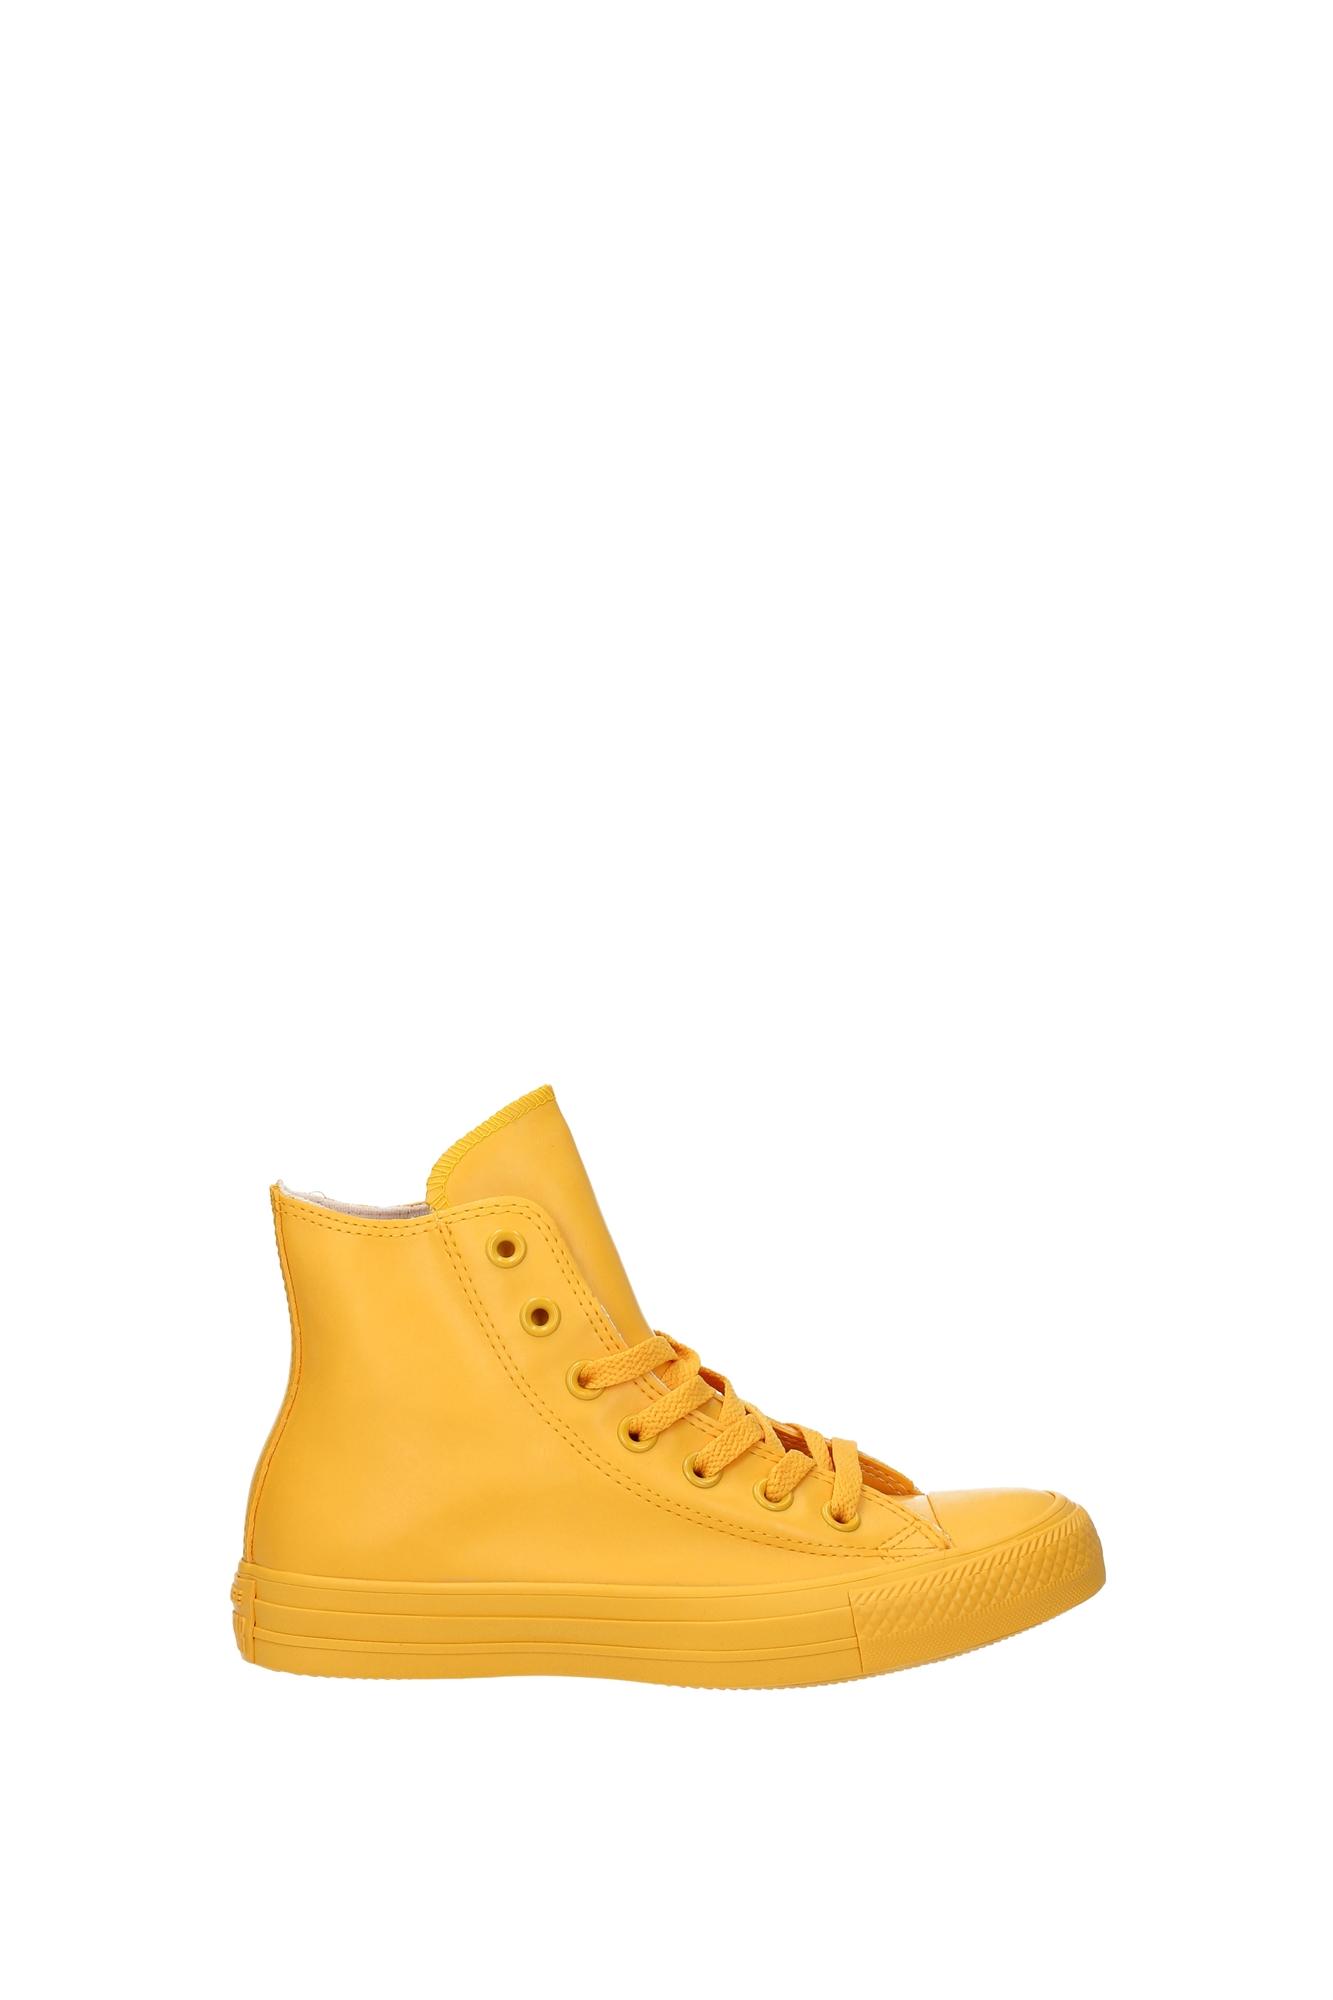 Superga 2795 señora zapatillas High-Top azul zapatillas de deporte s00dgp0-905 azul High-Top Nuevo b027c5